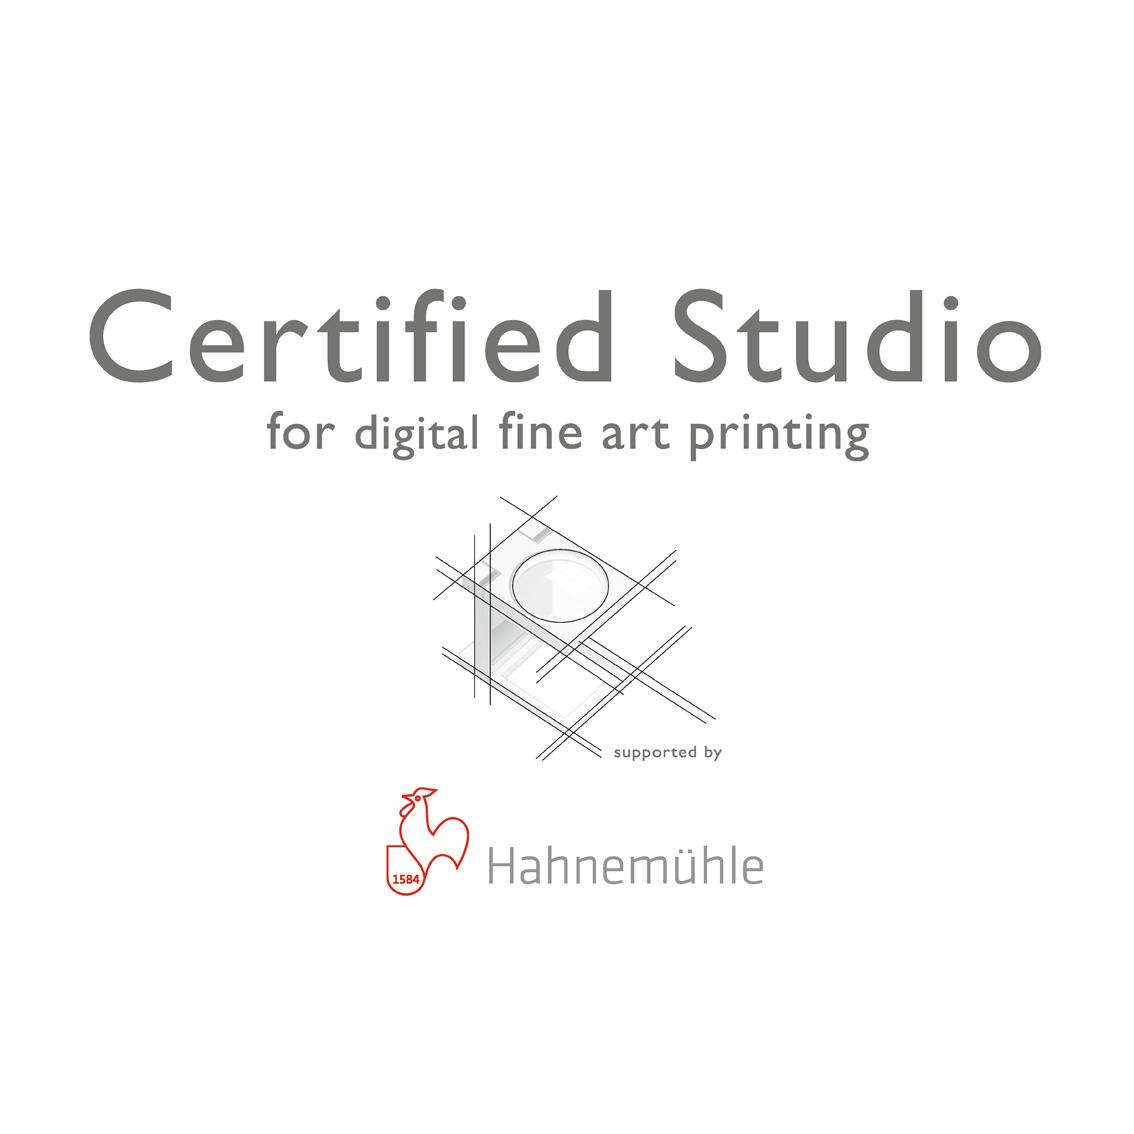 Certified Studio Hahnemühle